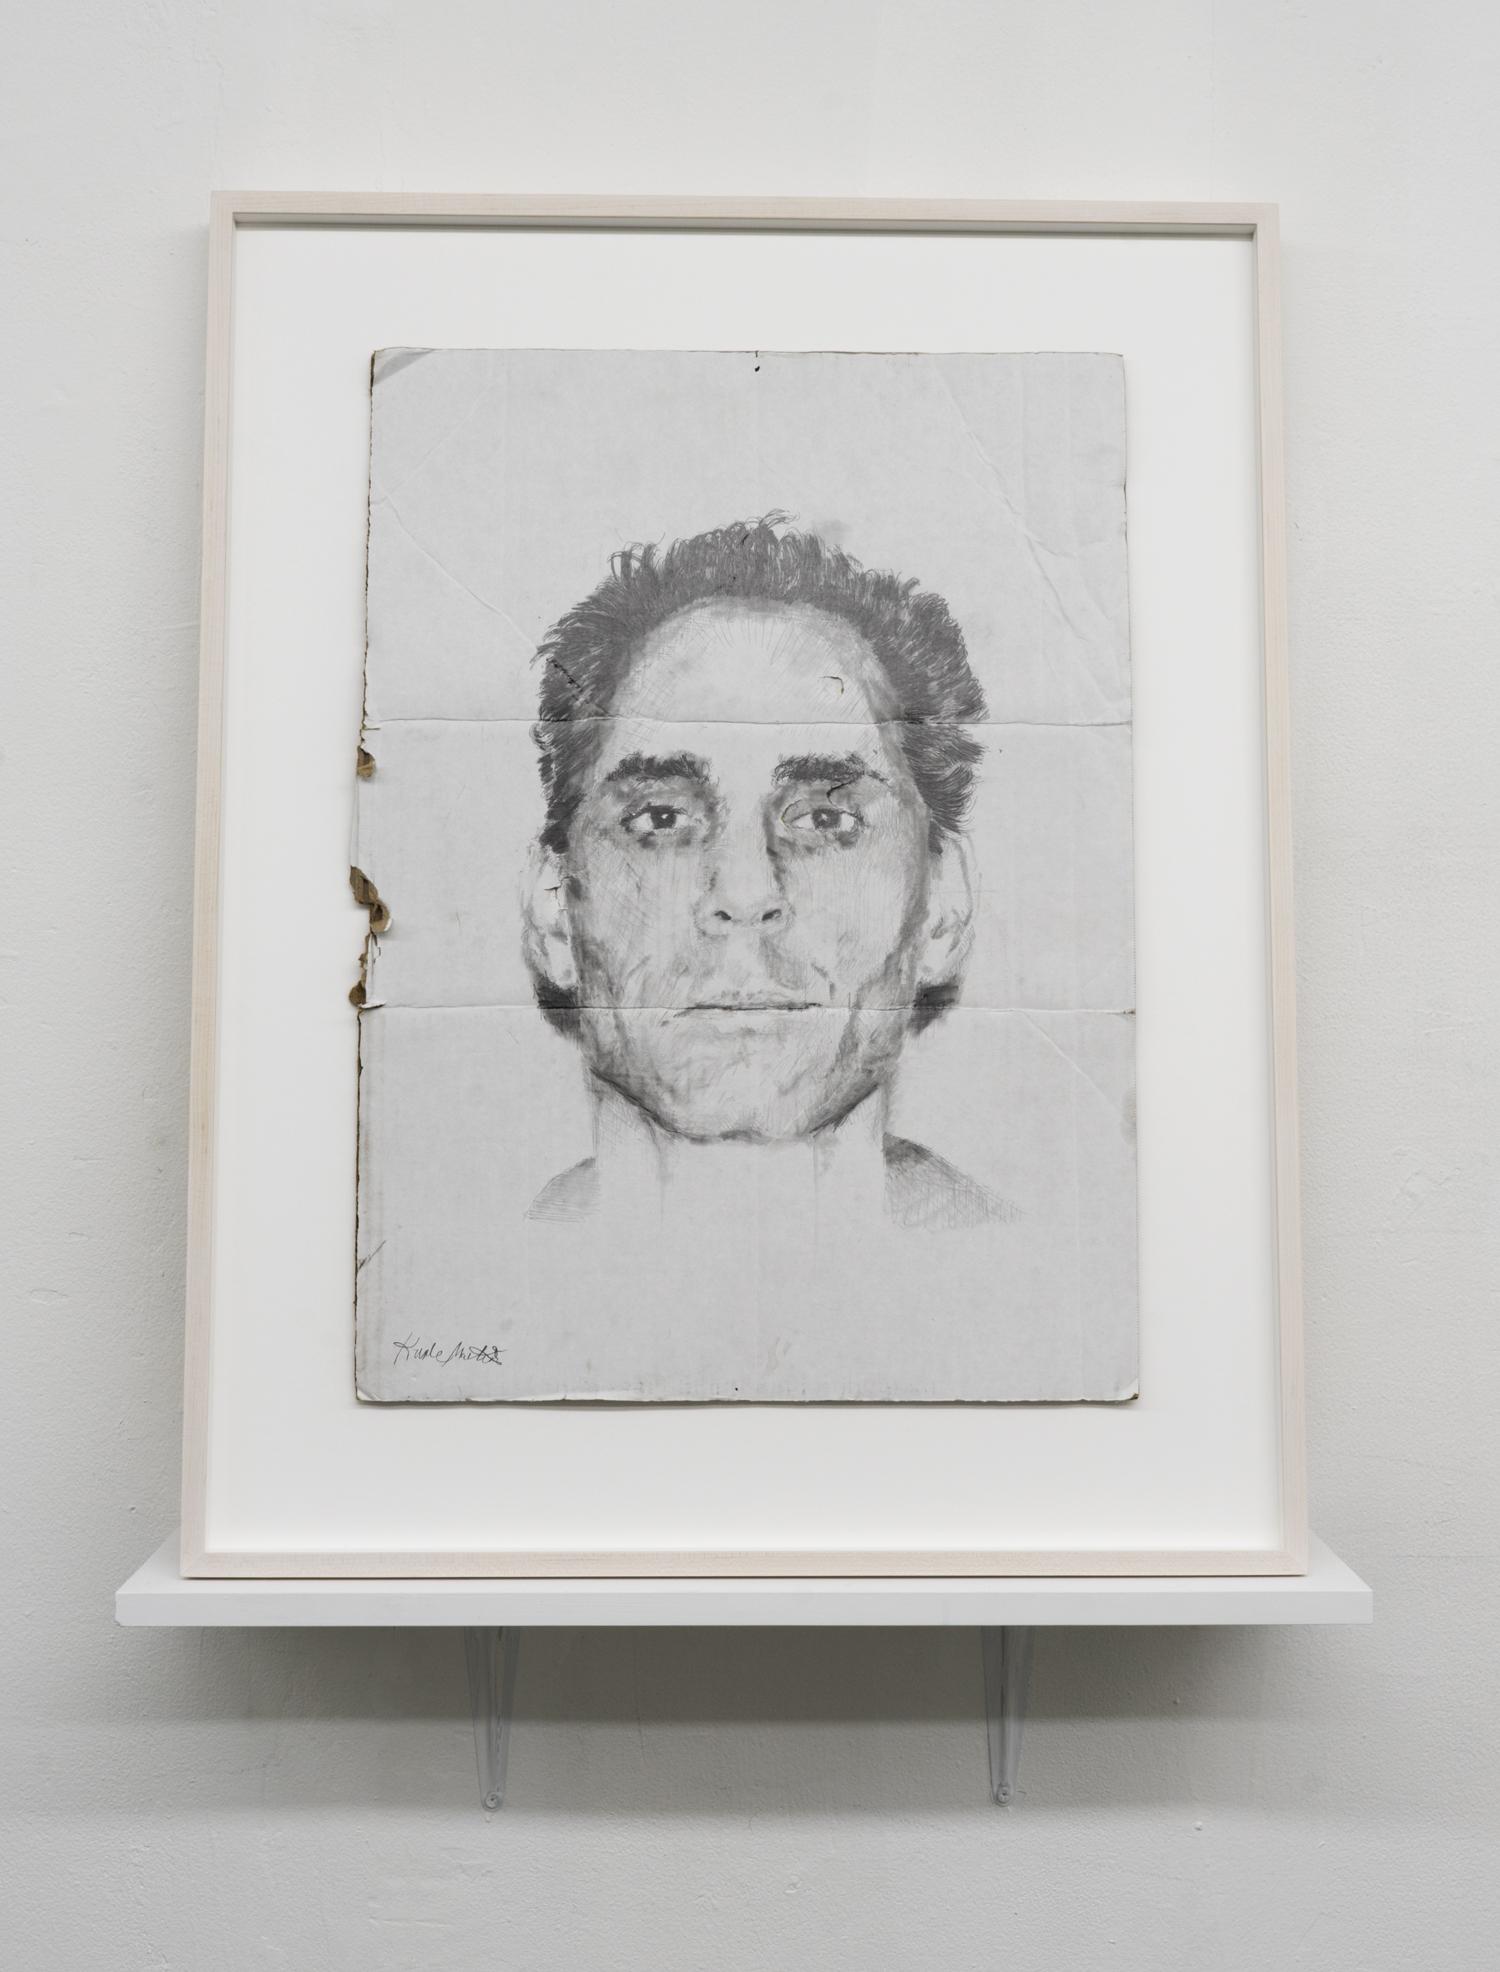 Kunle F. Martins,  Tony,  2019, pencil on found white cardboard box, 29 × 23 ½ inches